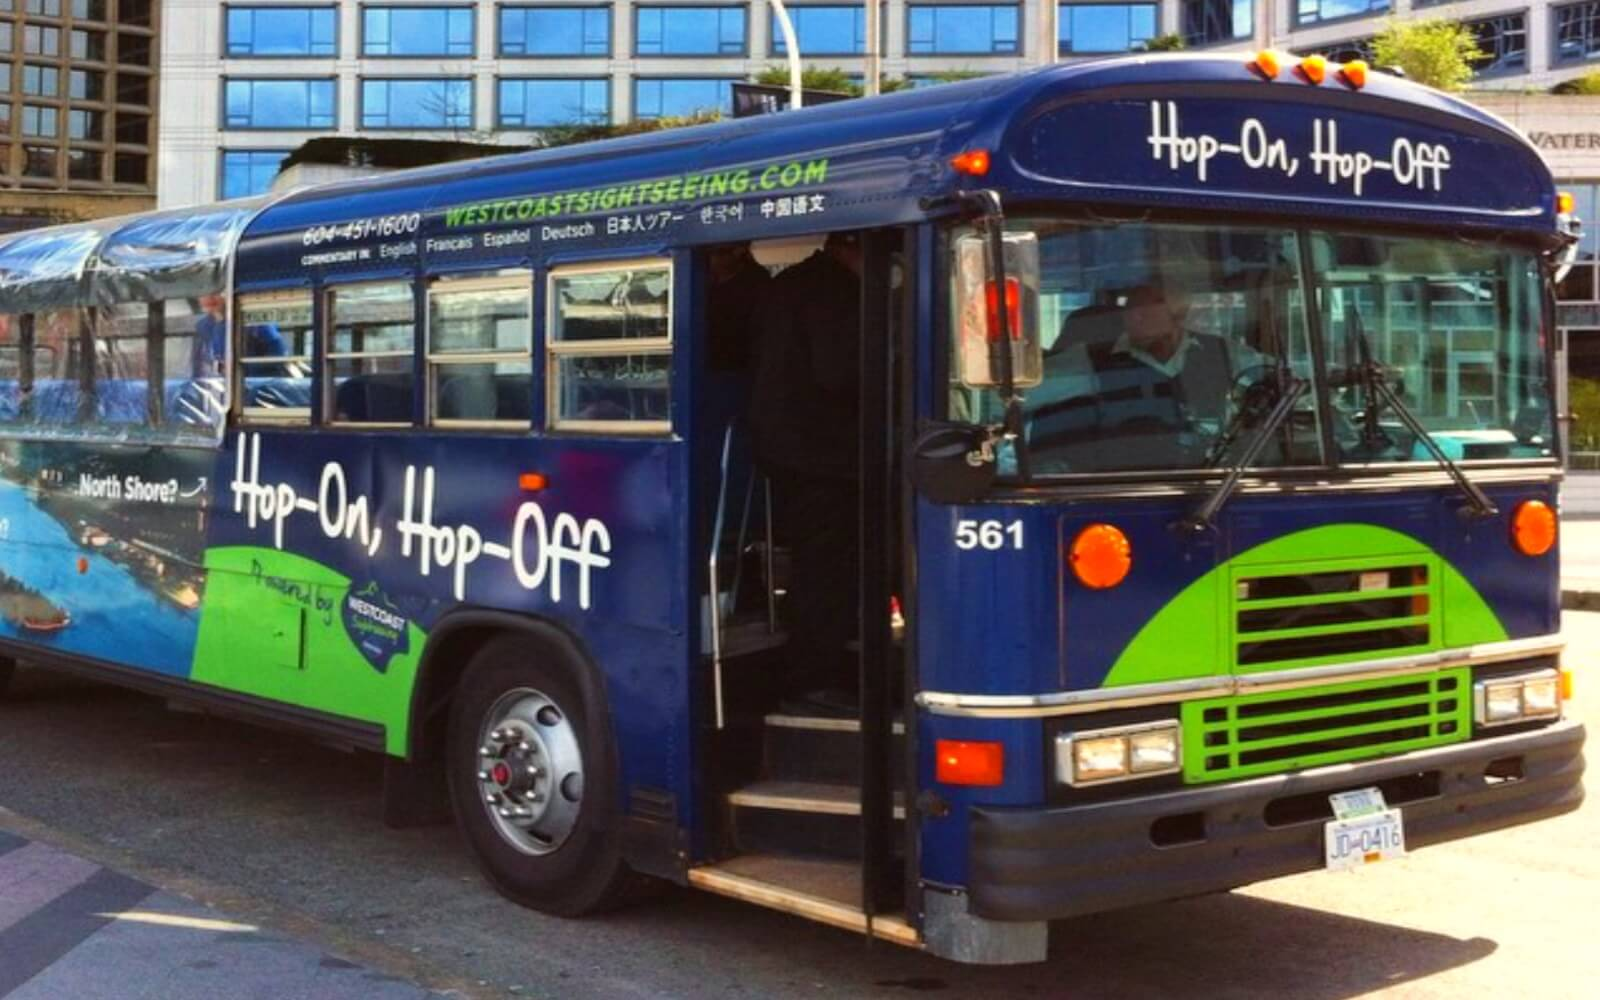 A Westcoast Sightseeing bus awaits boarding